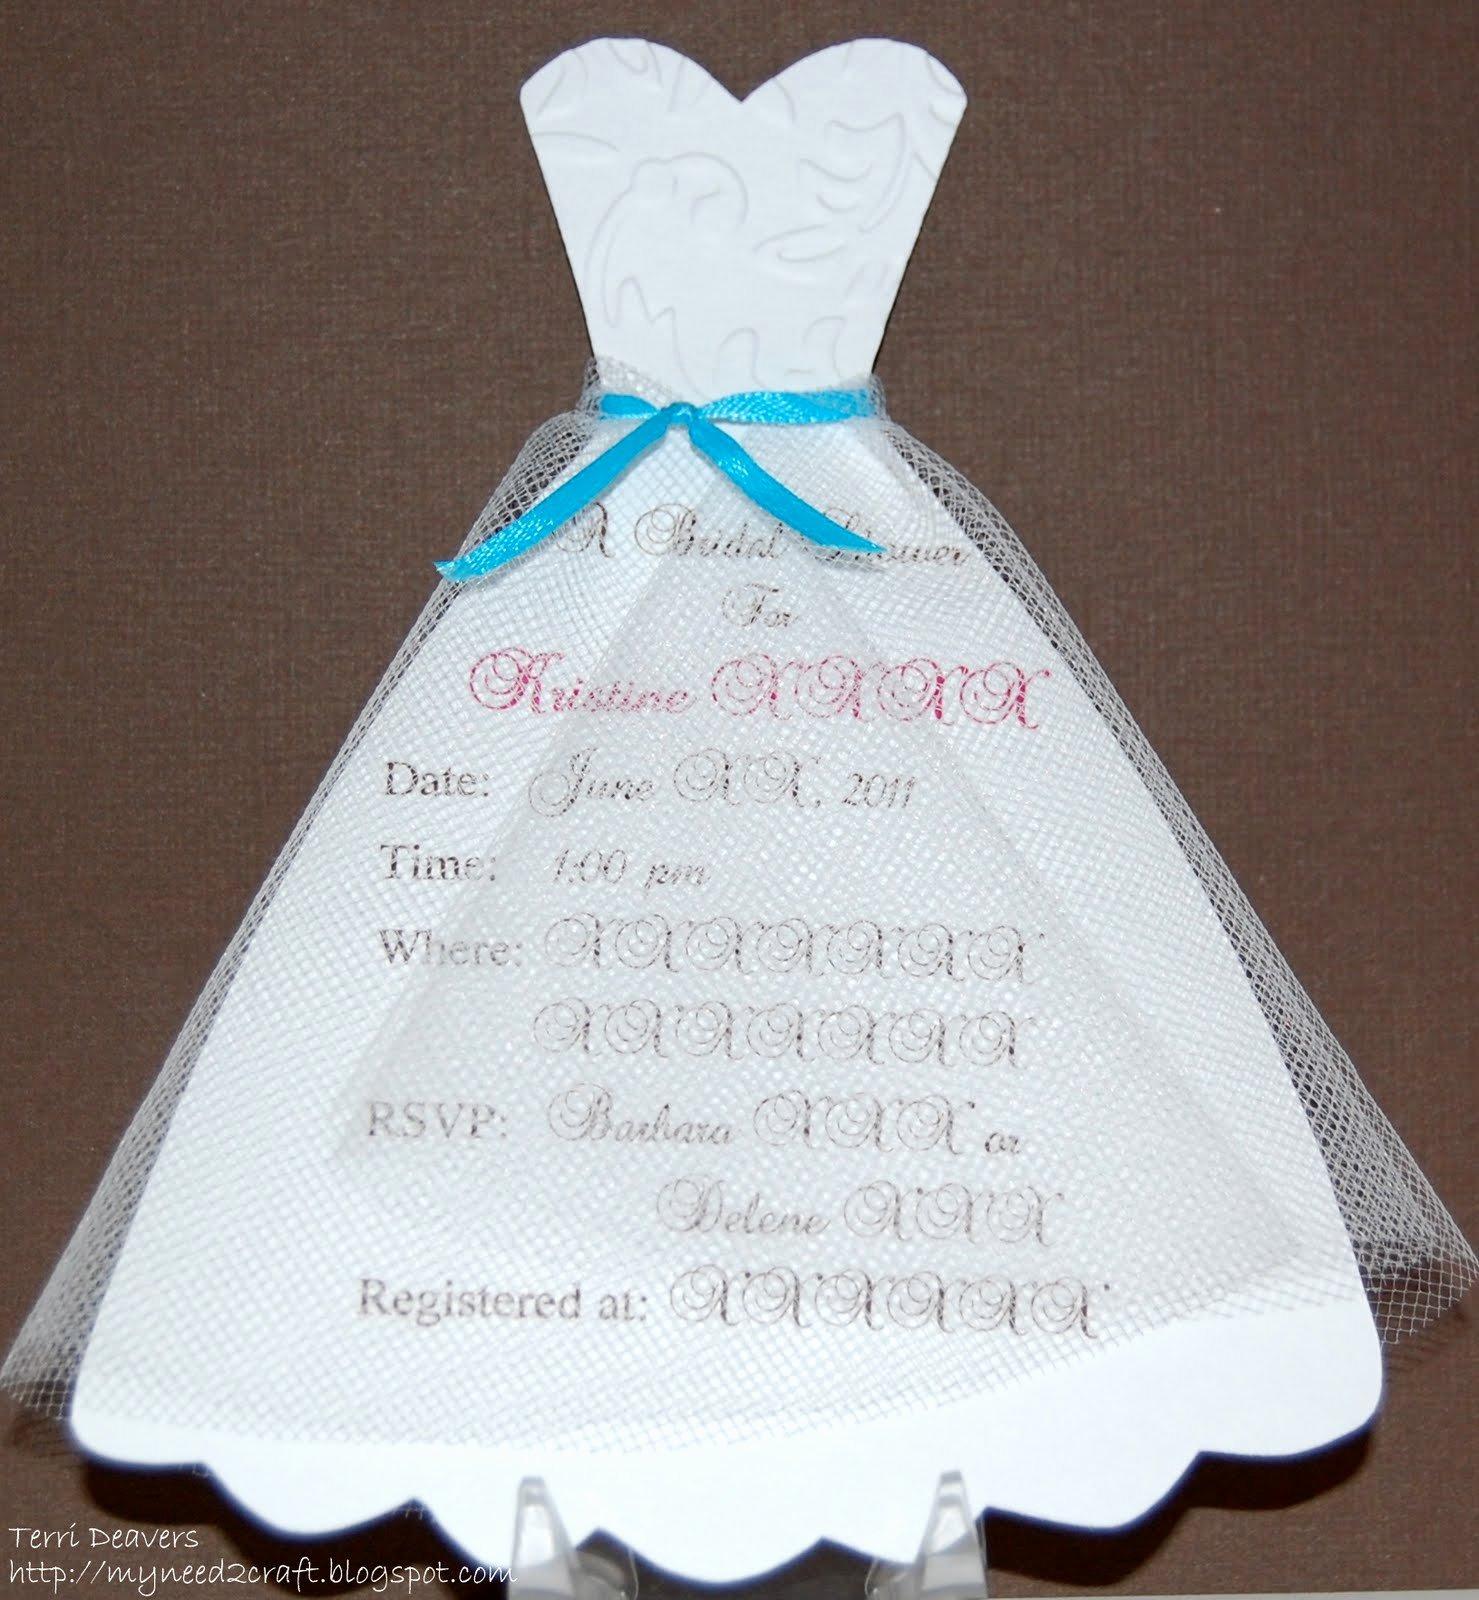 Bridal Shower Invite Template Beautiful Myneed2craft by Terri Deavers Bridal Shower Invitations